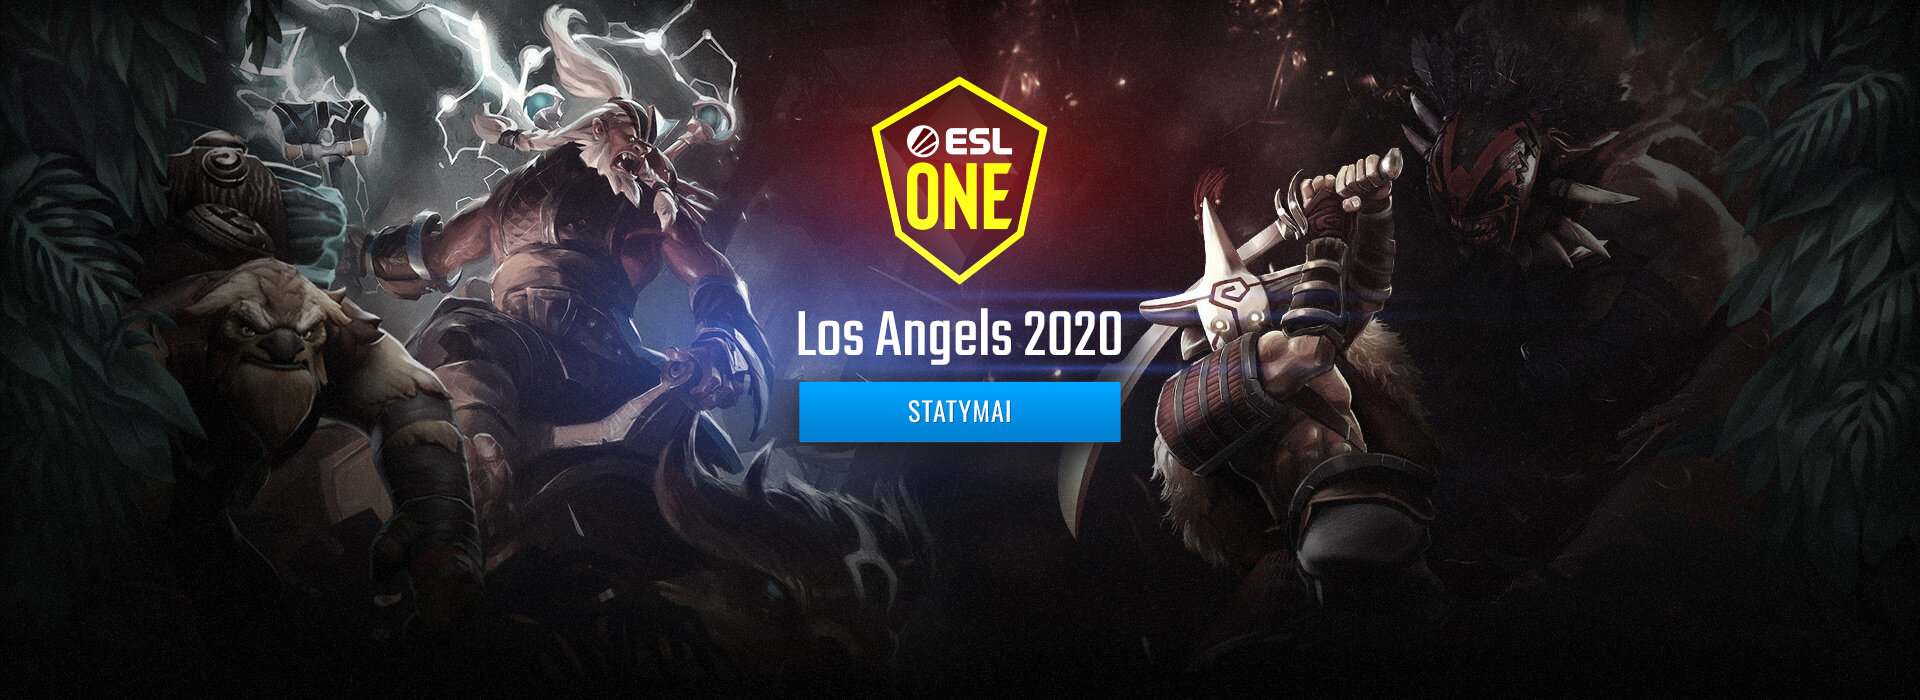 Dota 2 ESL One Los Angeles